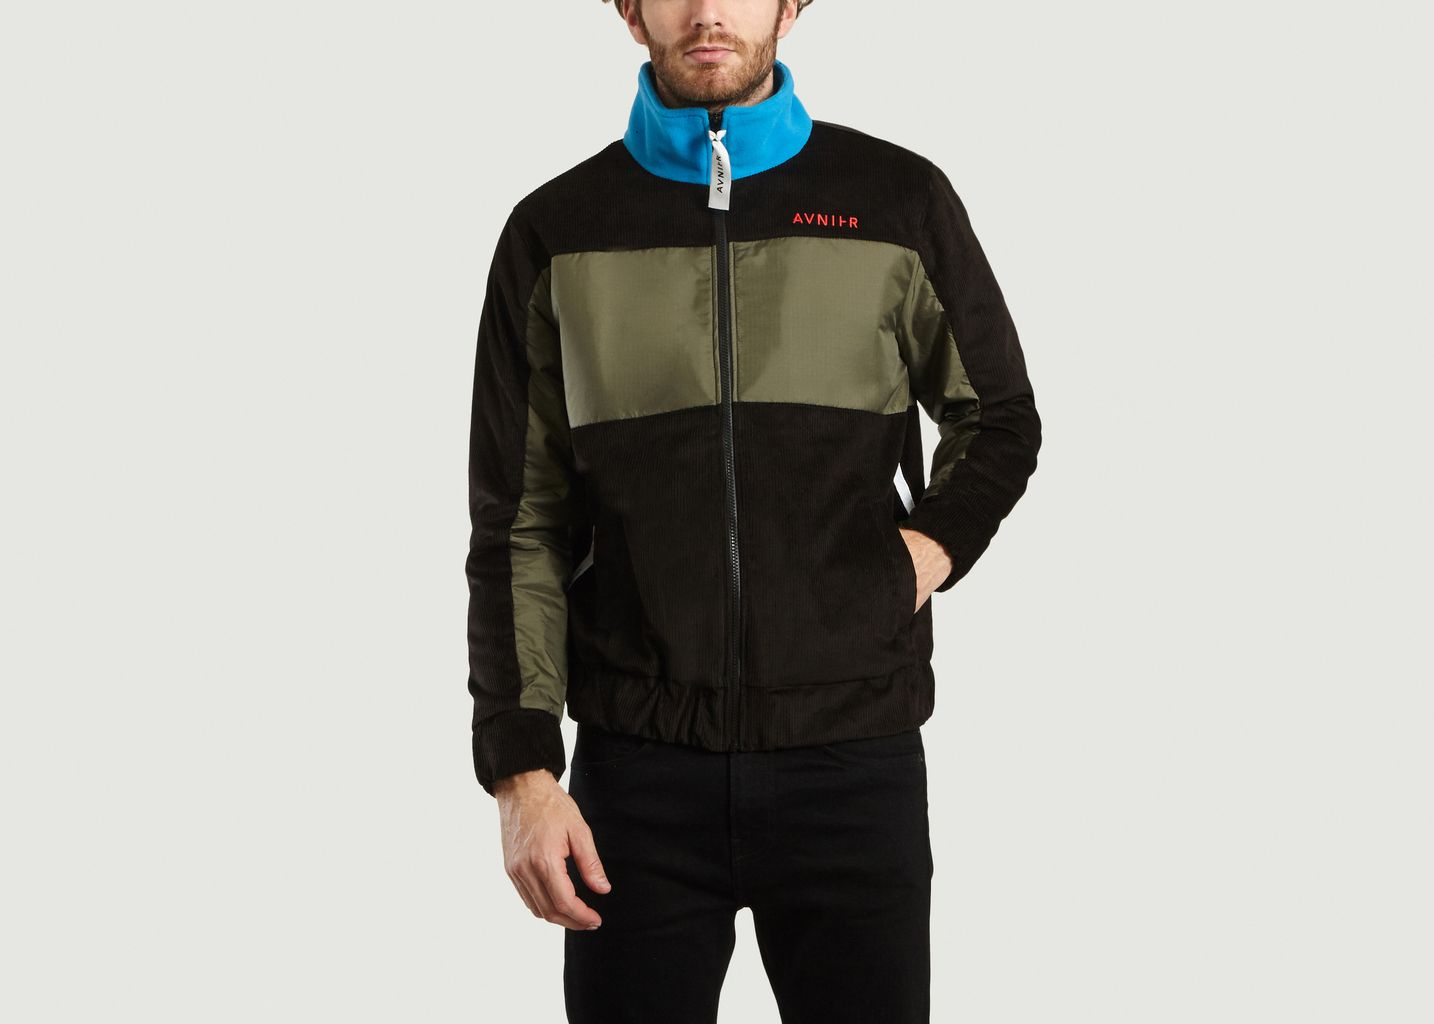 353947f39 Assemblage Zip Jacket Black AVNIER   L'Exception